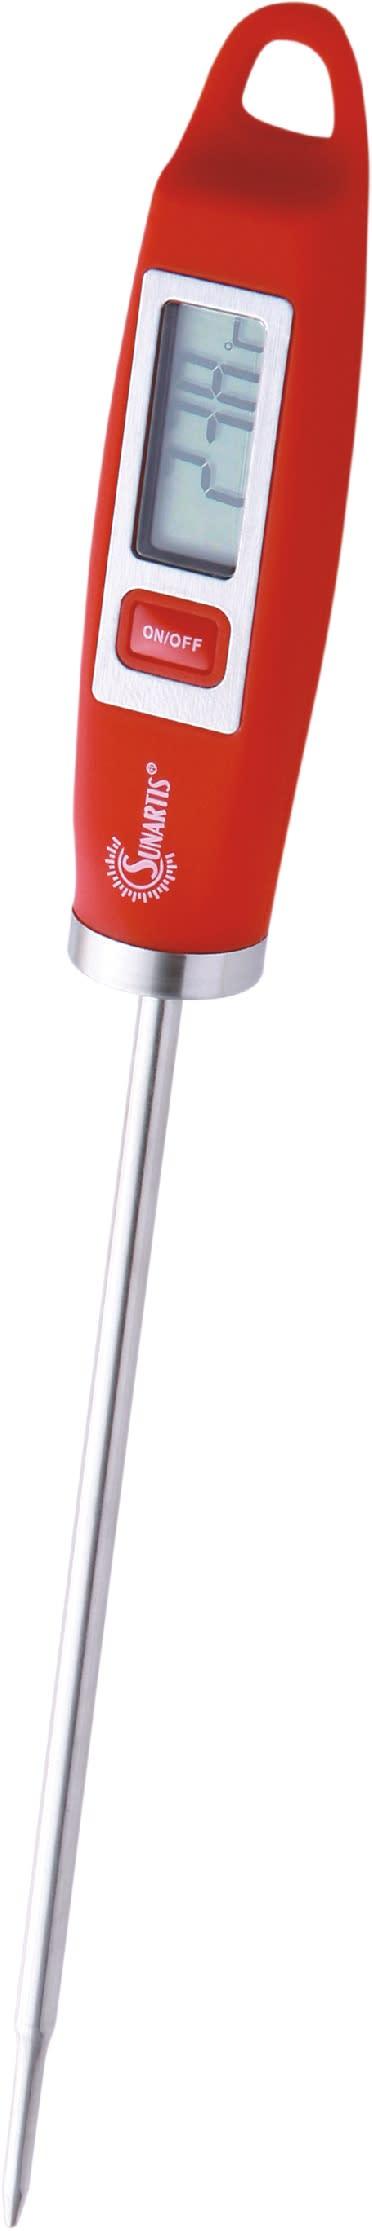 Mingle Universaltermometer